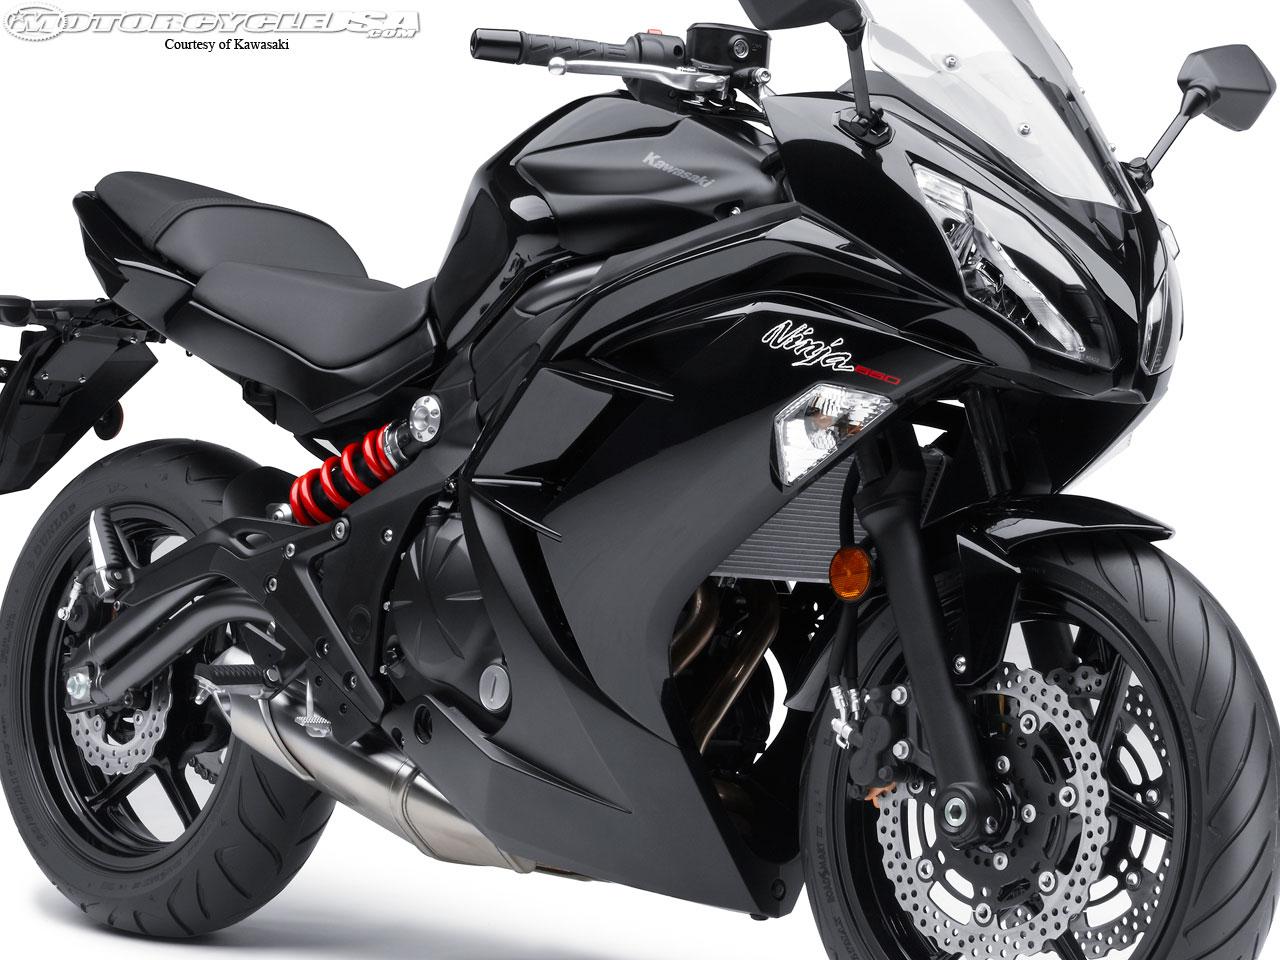 modifikasimotors: kawasaki ninja 650 zuperrr